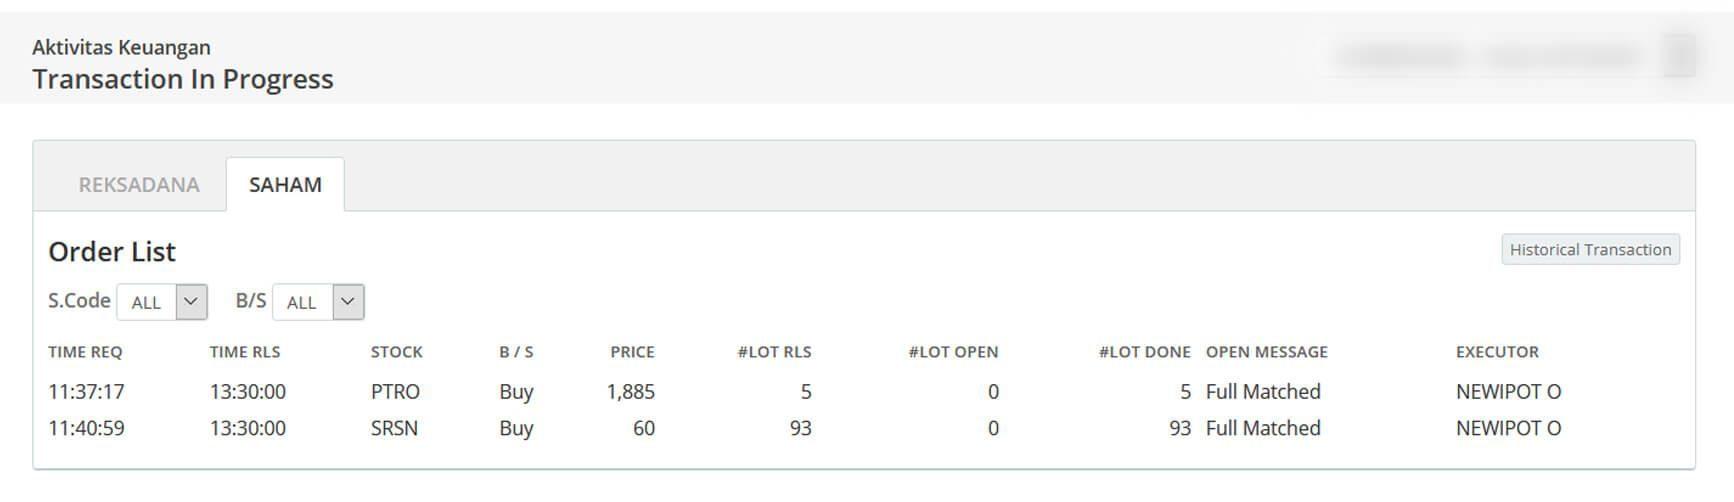 Screenshot Perkembangan Investasi Saham - Day 145, Kamis, 23 Juli 2020 Pembelian Saham